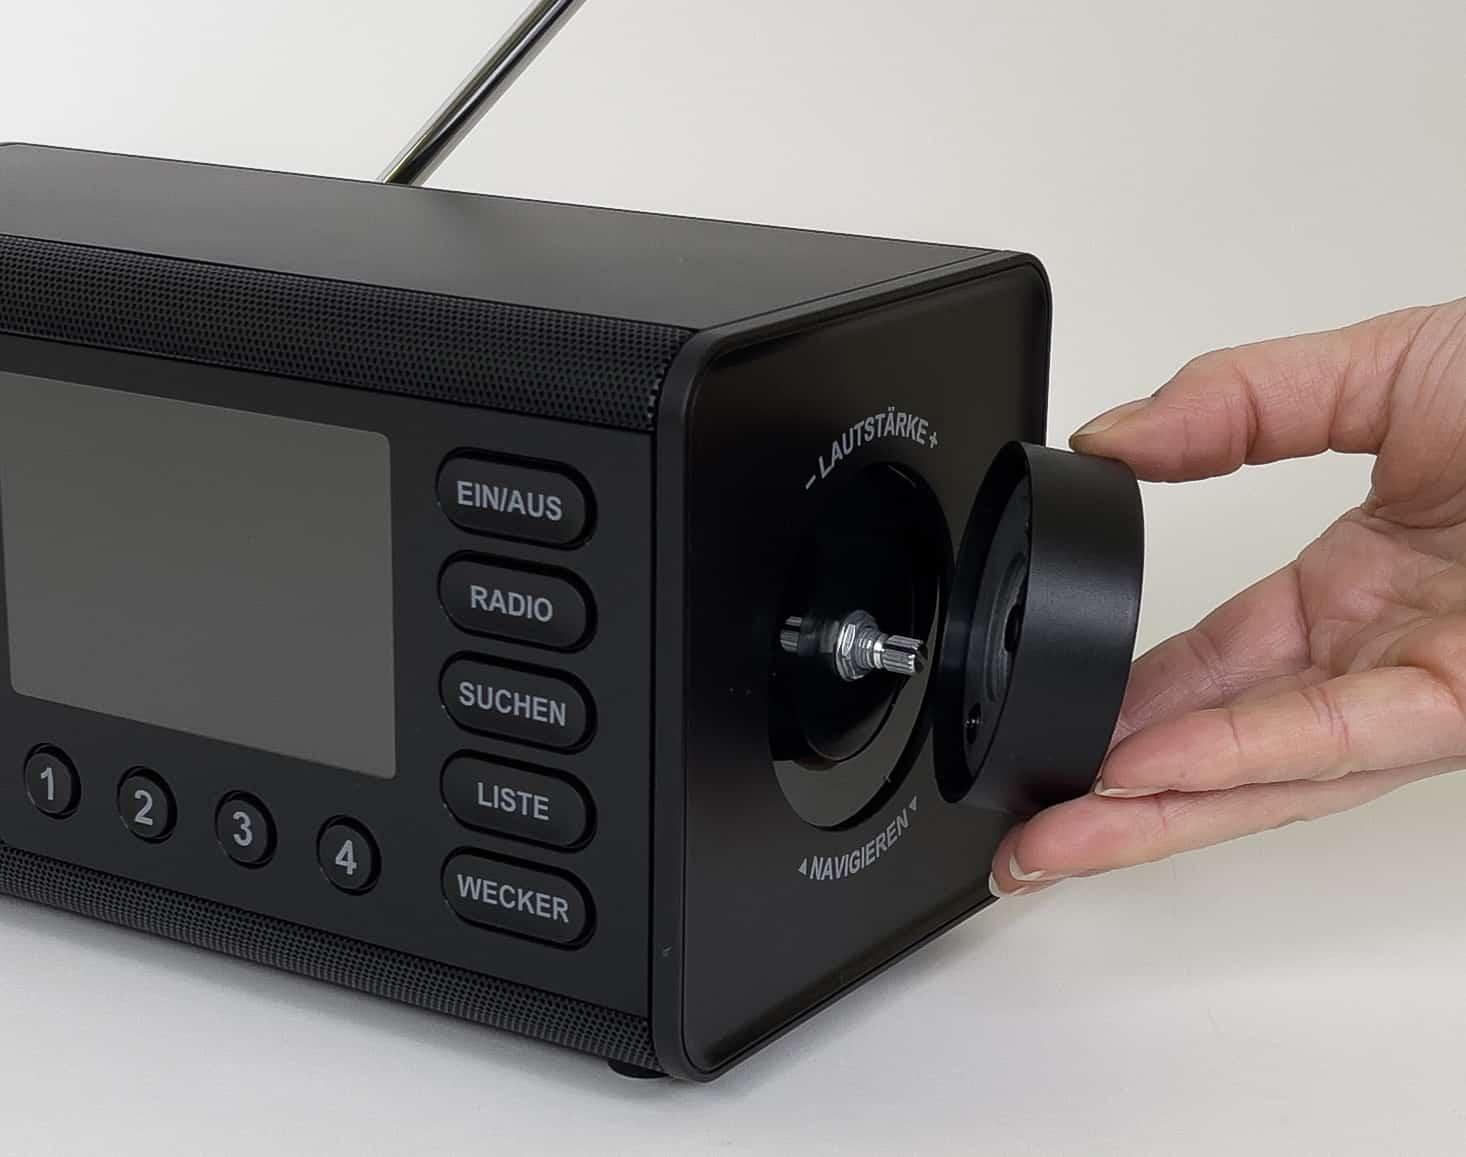 Digitalradio von Hama mit Regler